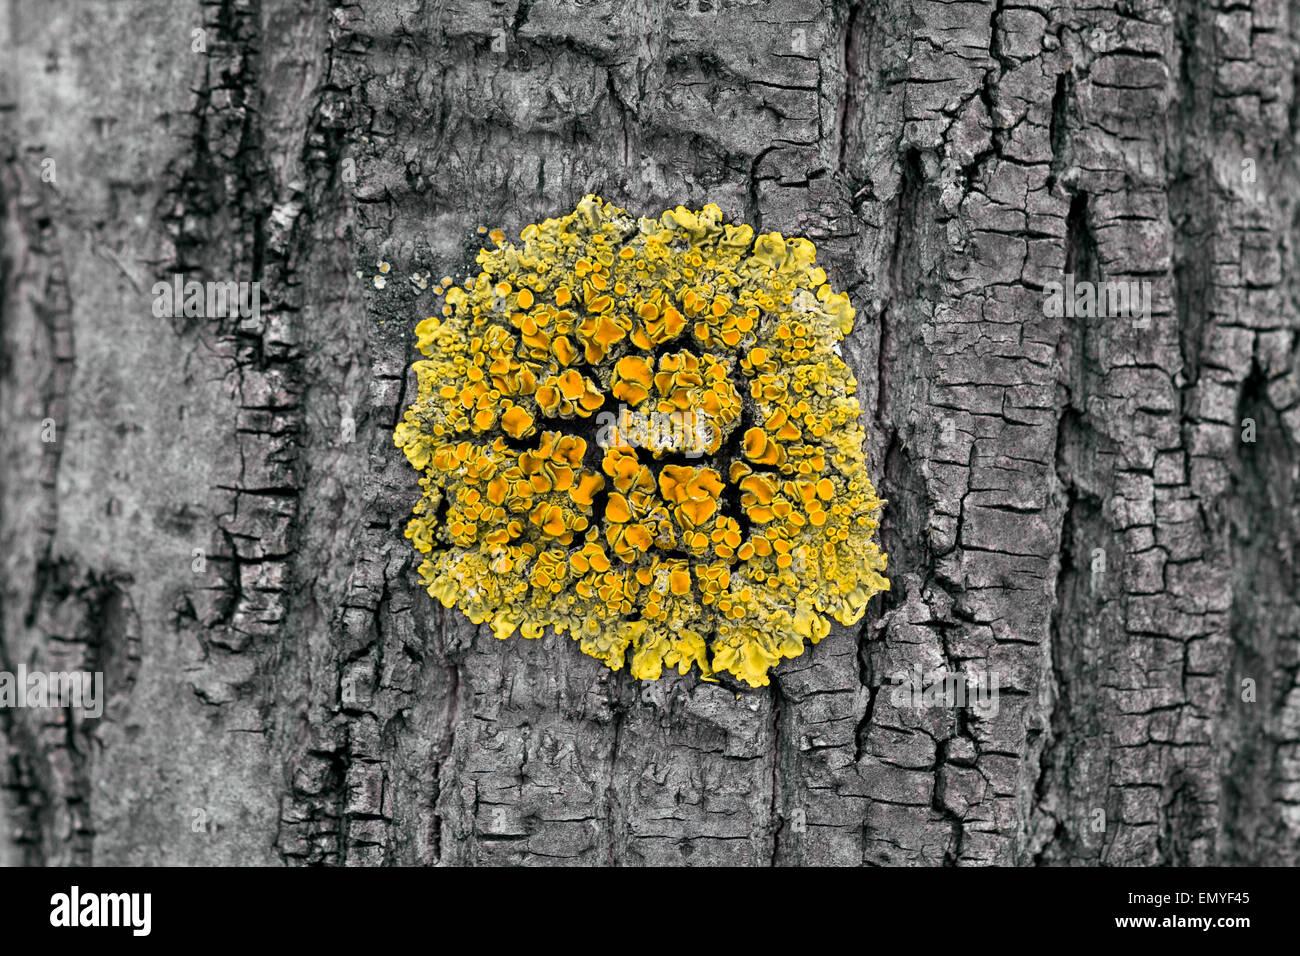 Yellow Xanthoria Parietina Lichen on Gray Tree Trunk - Stock Image